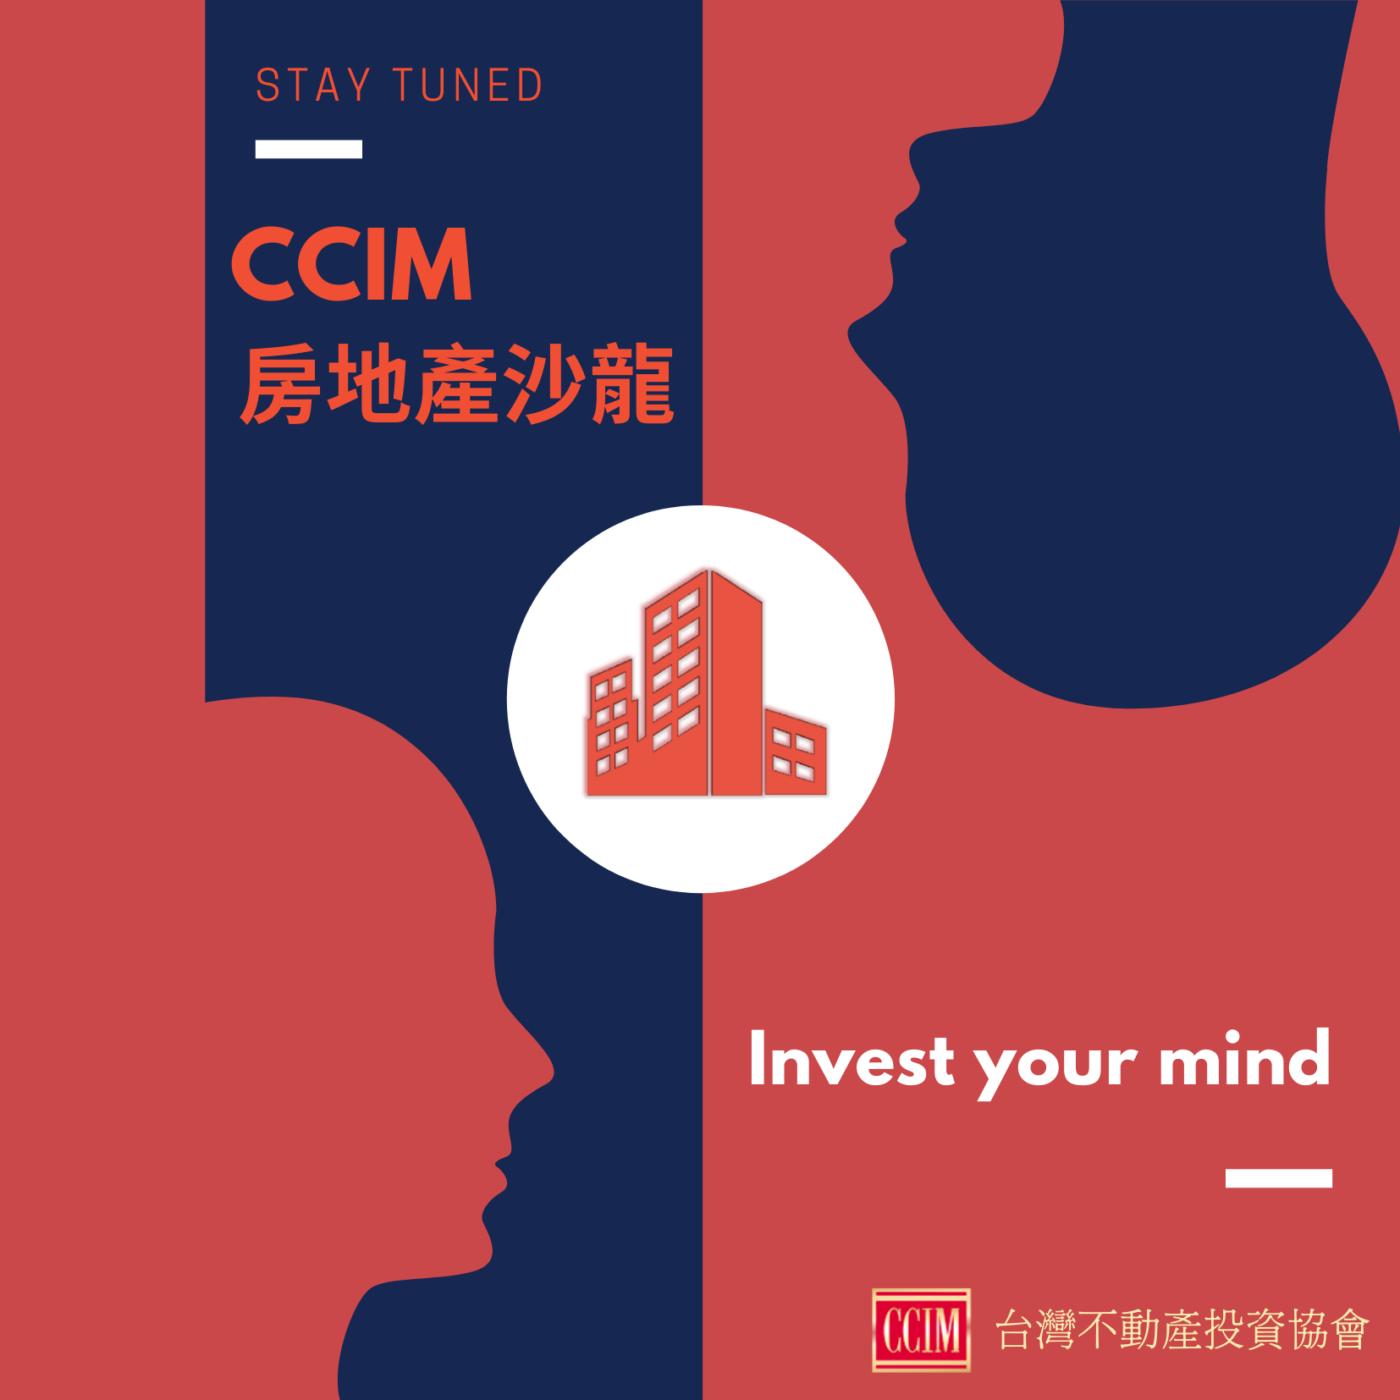 CCIM 房地產沙龍